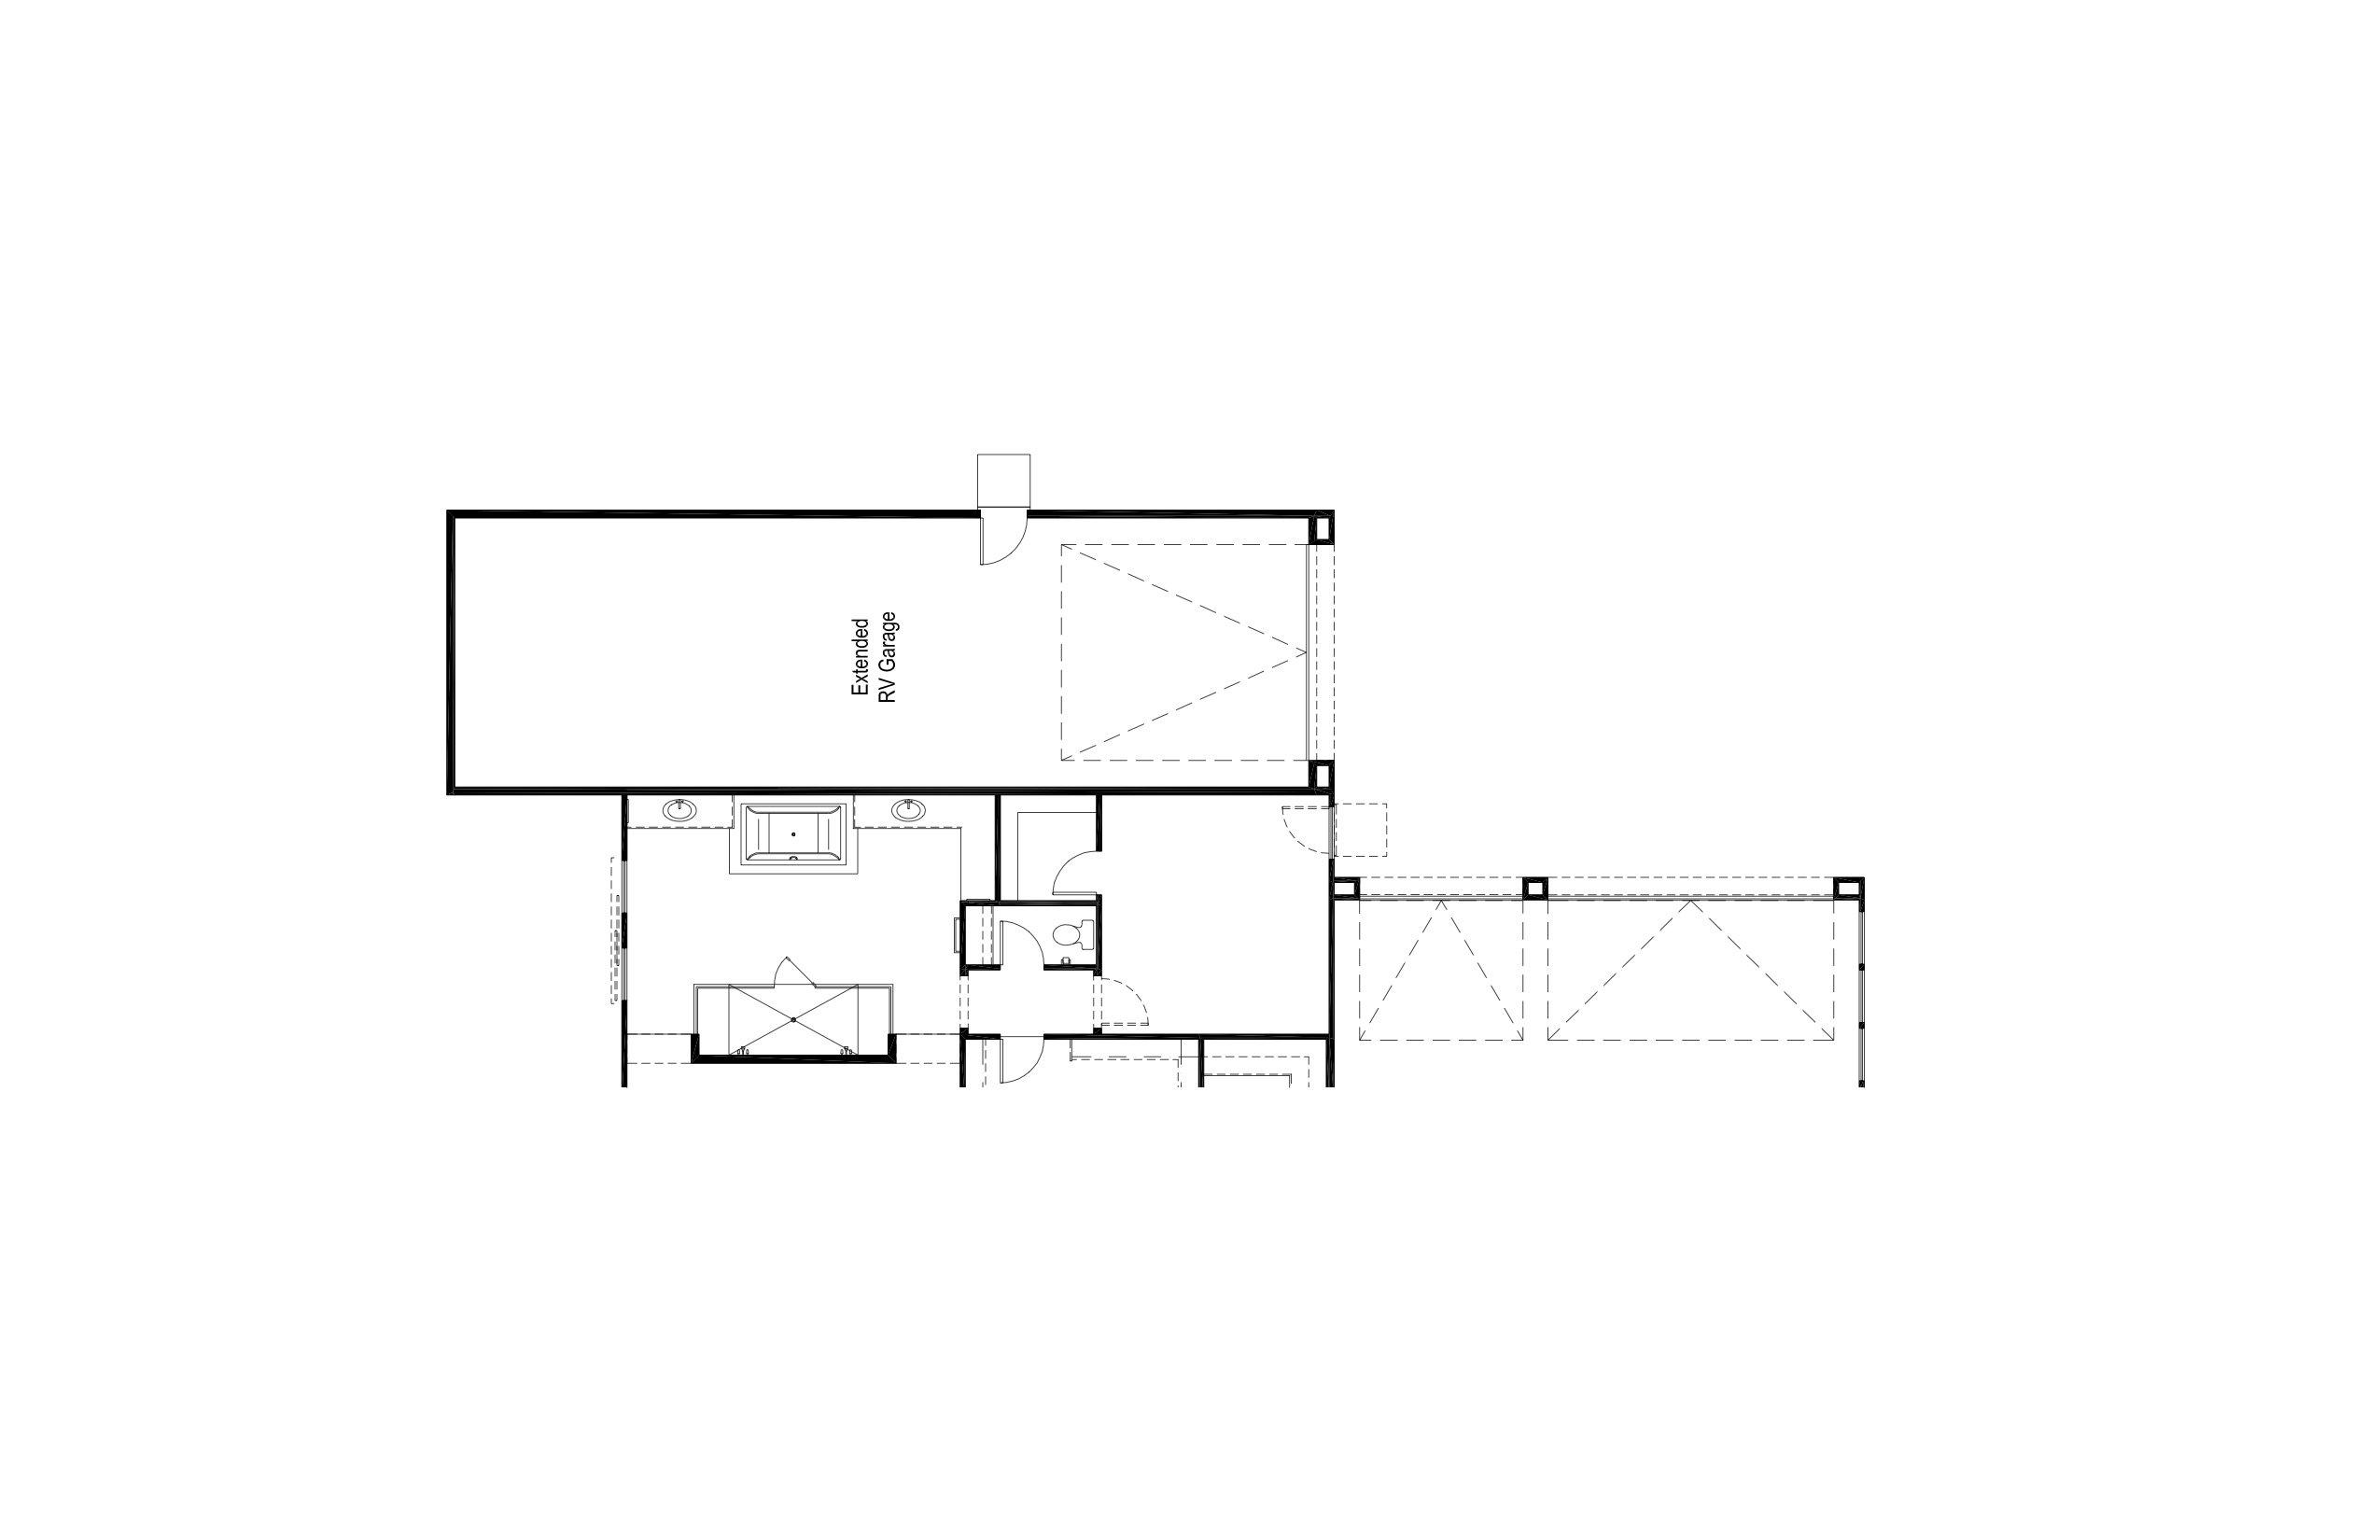 Plan 1 - Opt Extended RV Garage